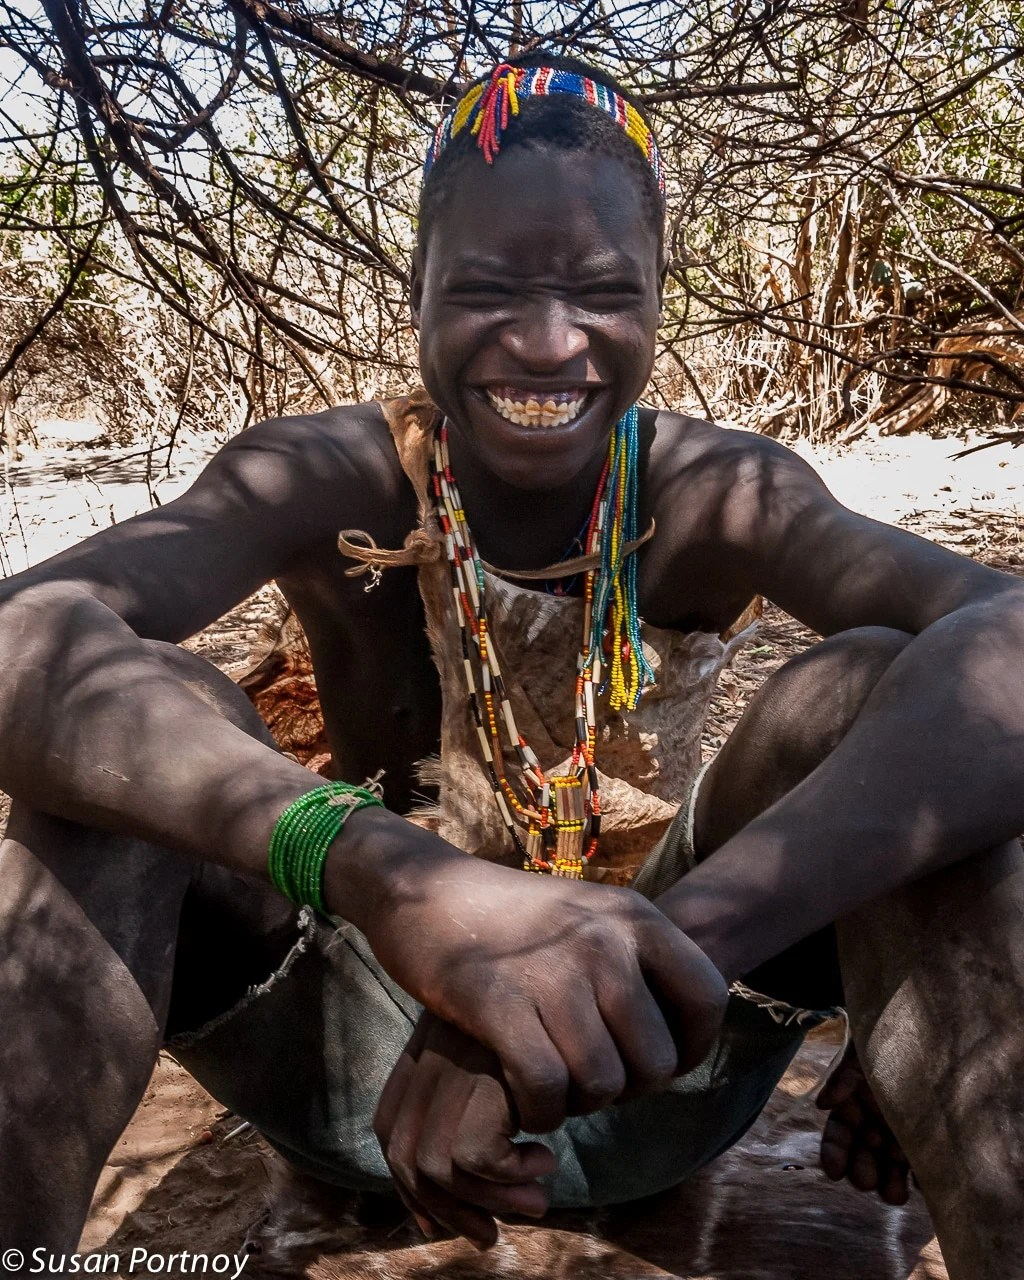 Smiling Hadzabe man in Tanzania